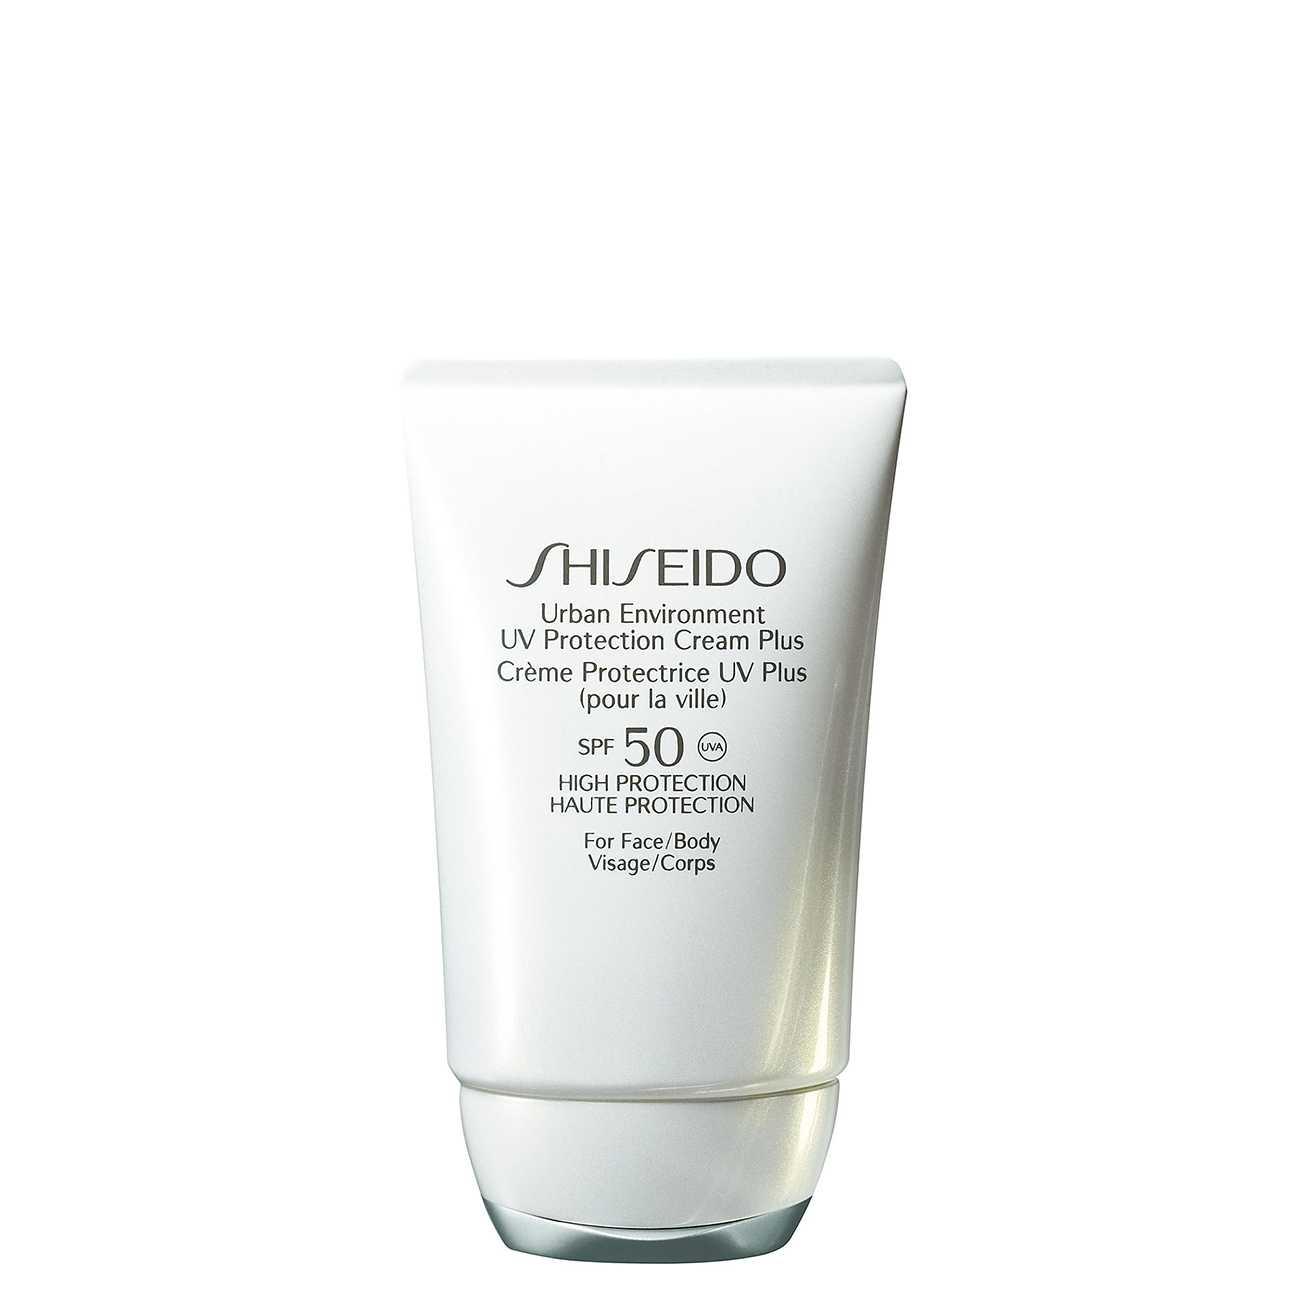 Urban Environment Uv Protection Cream Plus 50 Ml Shiseido imagine 2021 bestvalue.eu